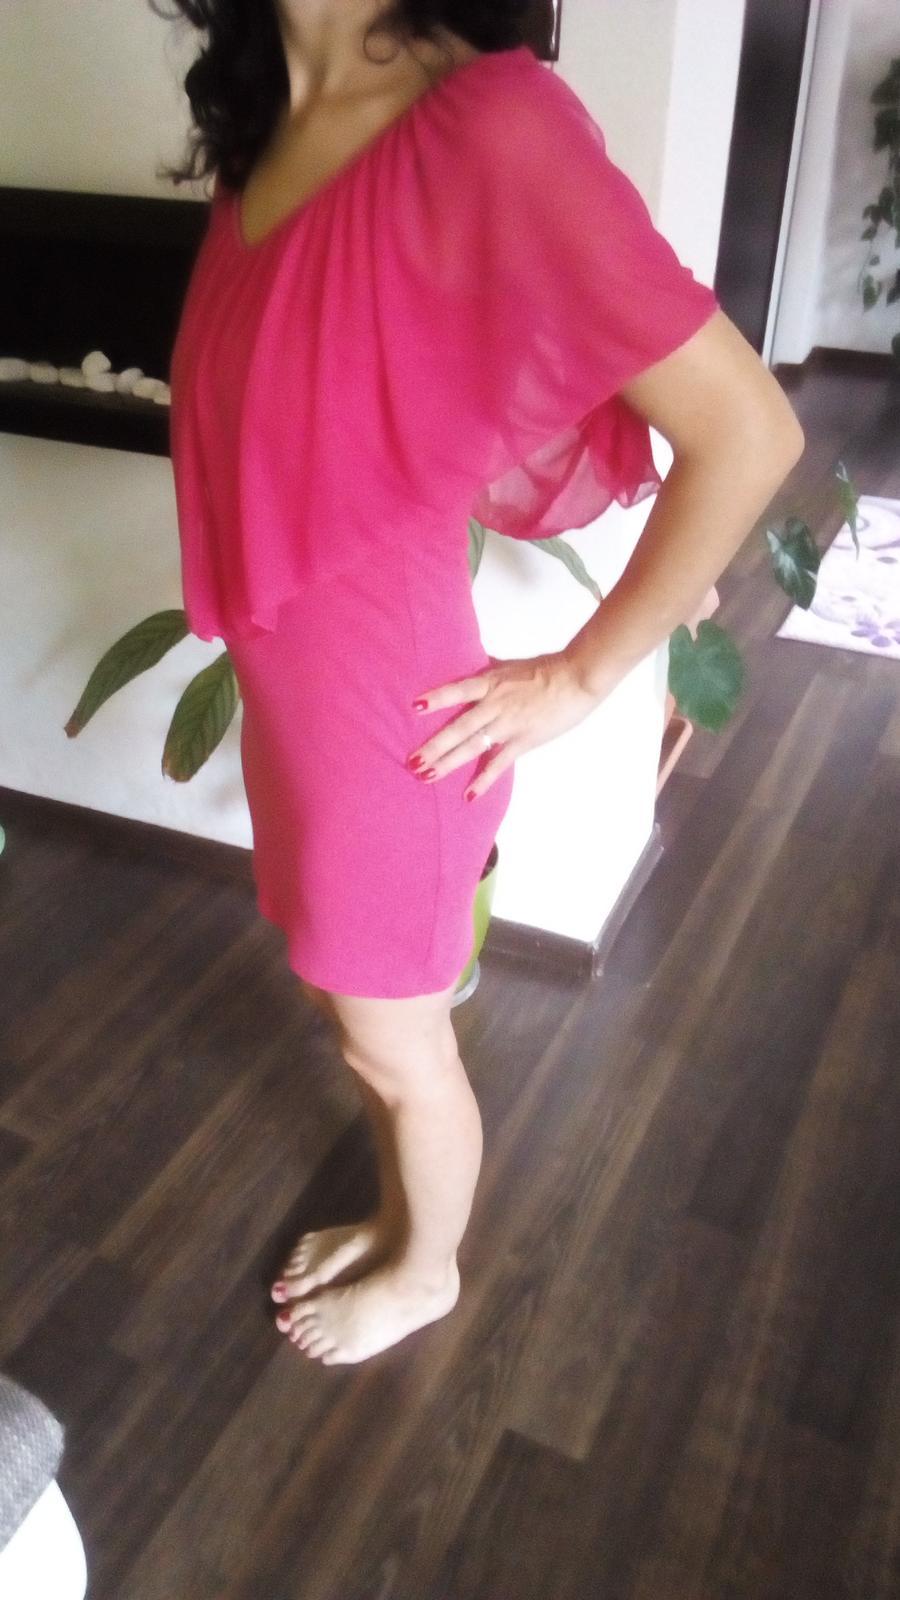 Cyklamenové  šaty Bonprix - Obrázok č. 1